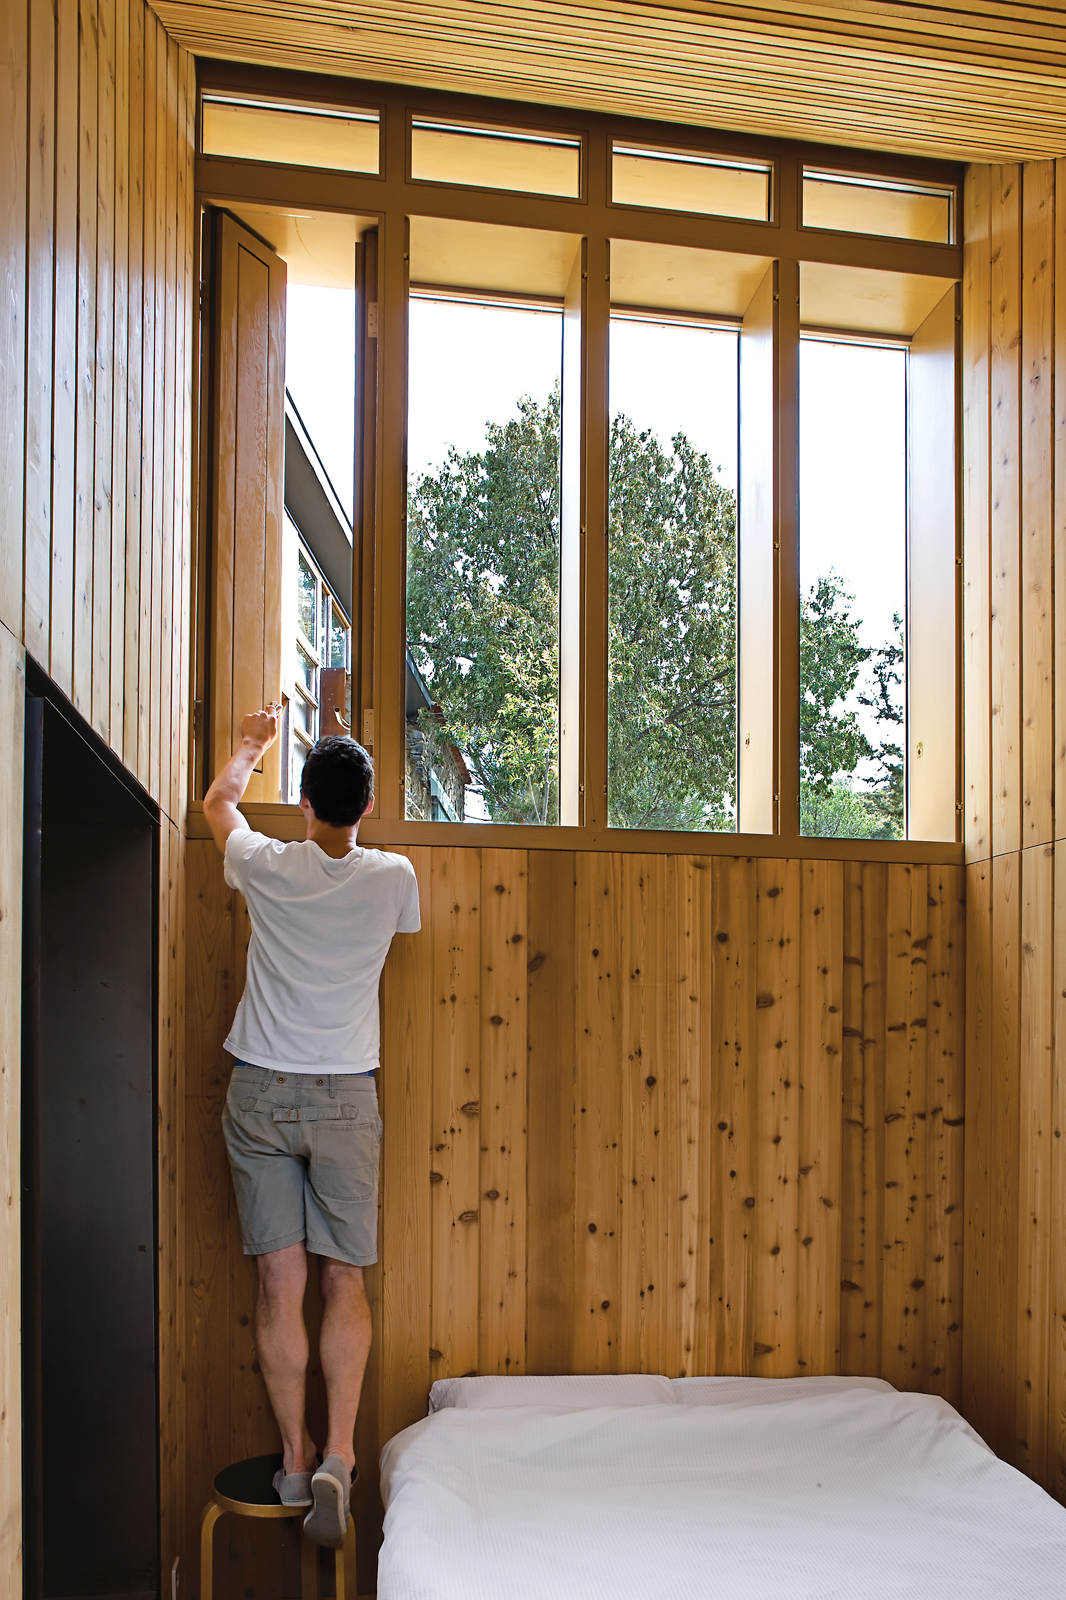 Modern bedroom clad in wood